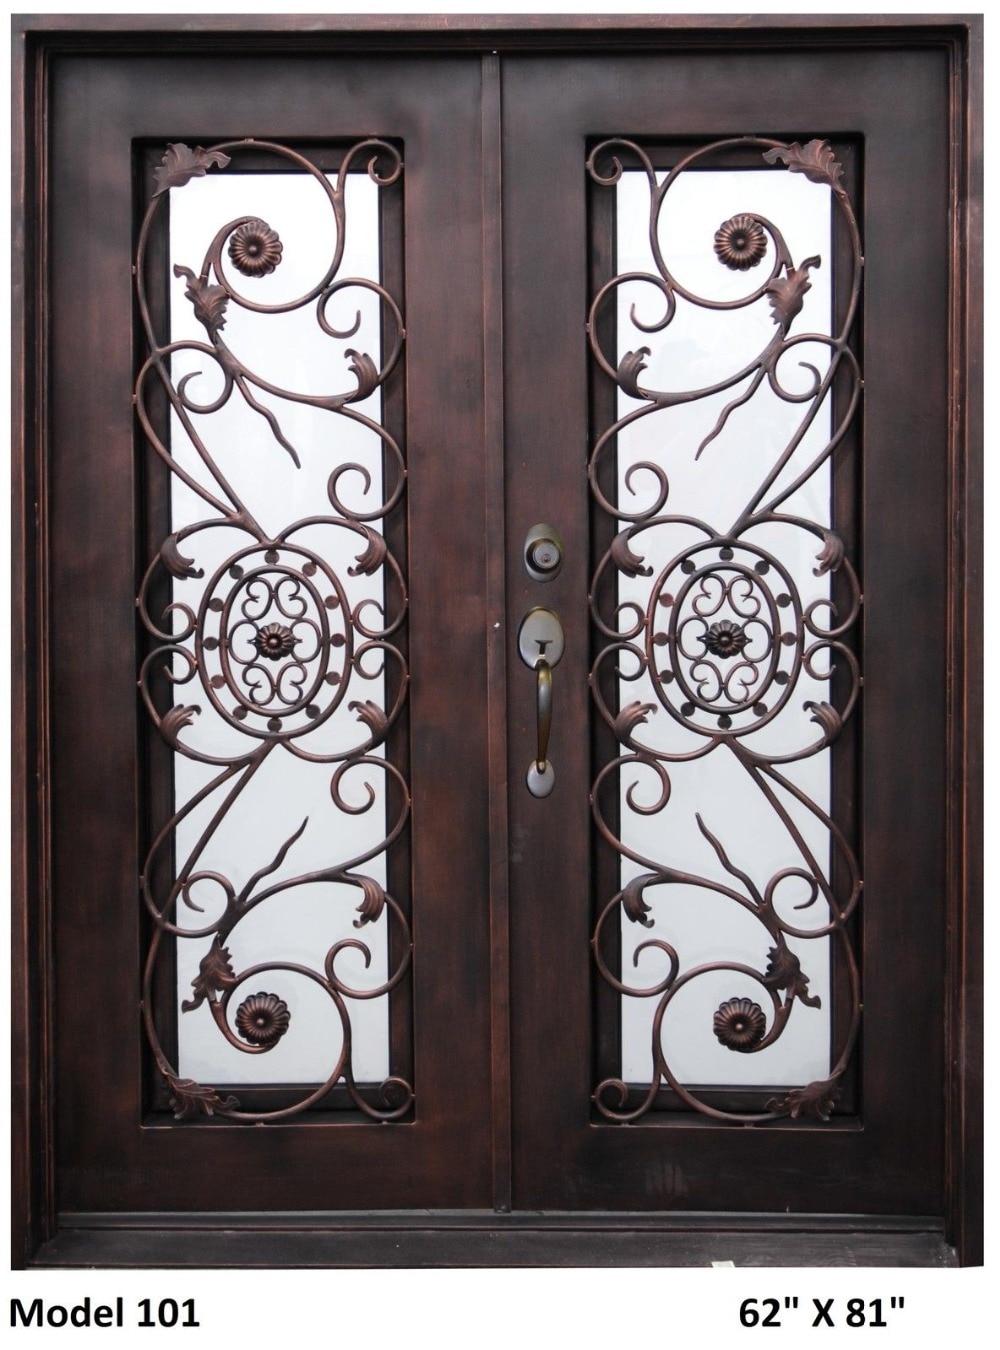 Hench 100% Steel Iron Doors  Model Hc-id109